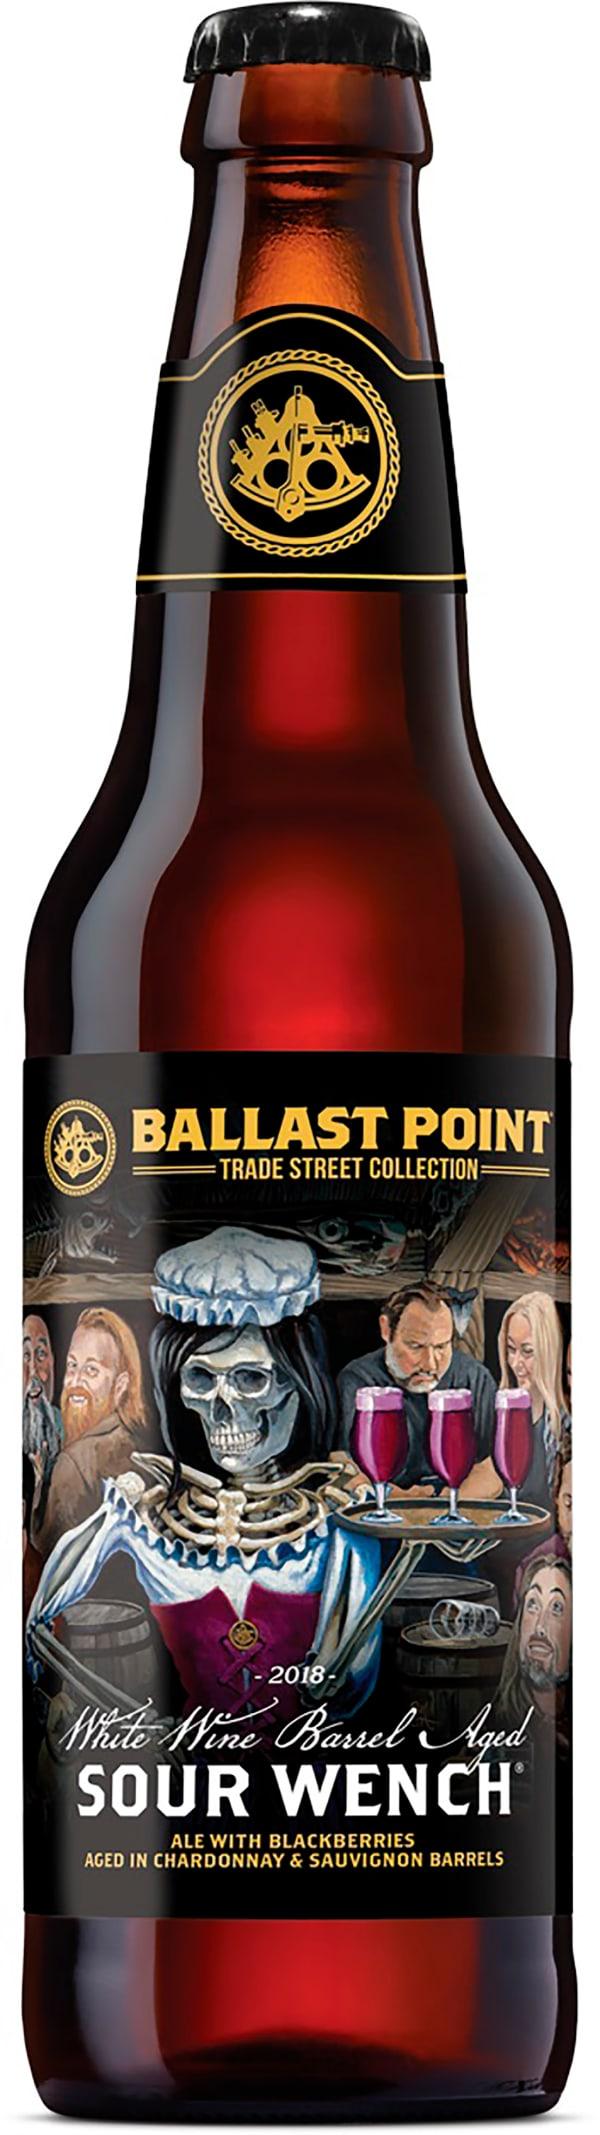 Ballast Point White Wine Barrel Aged Sour Wench